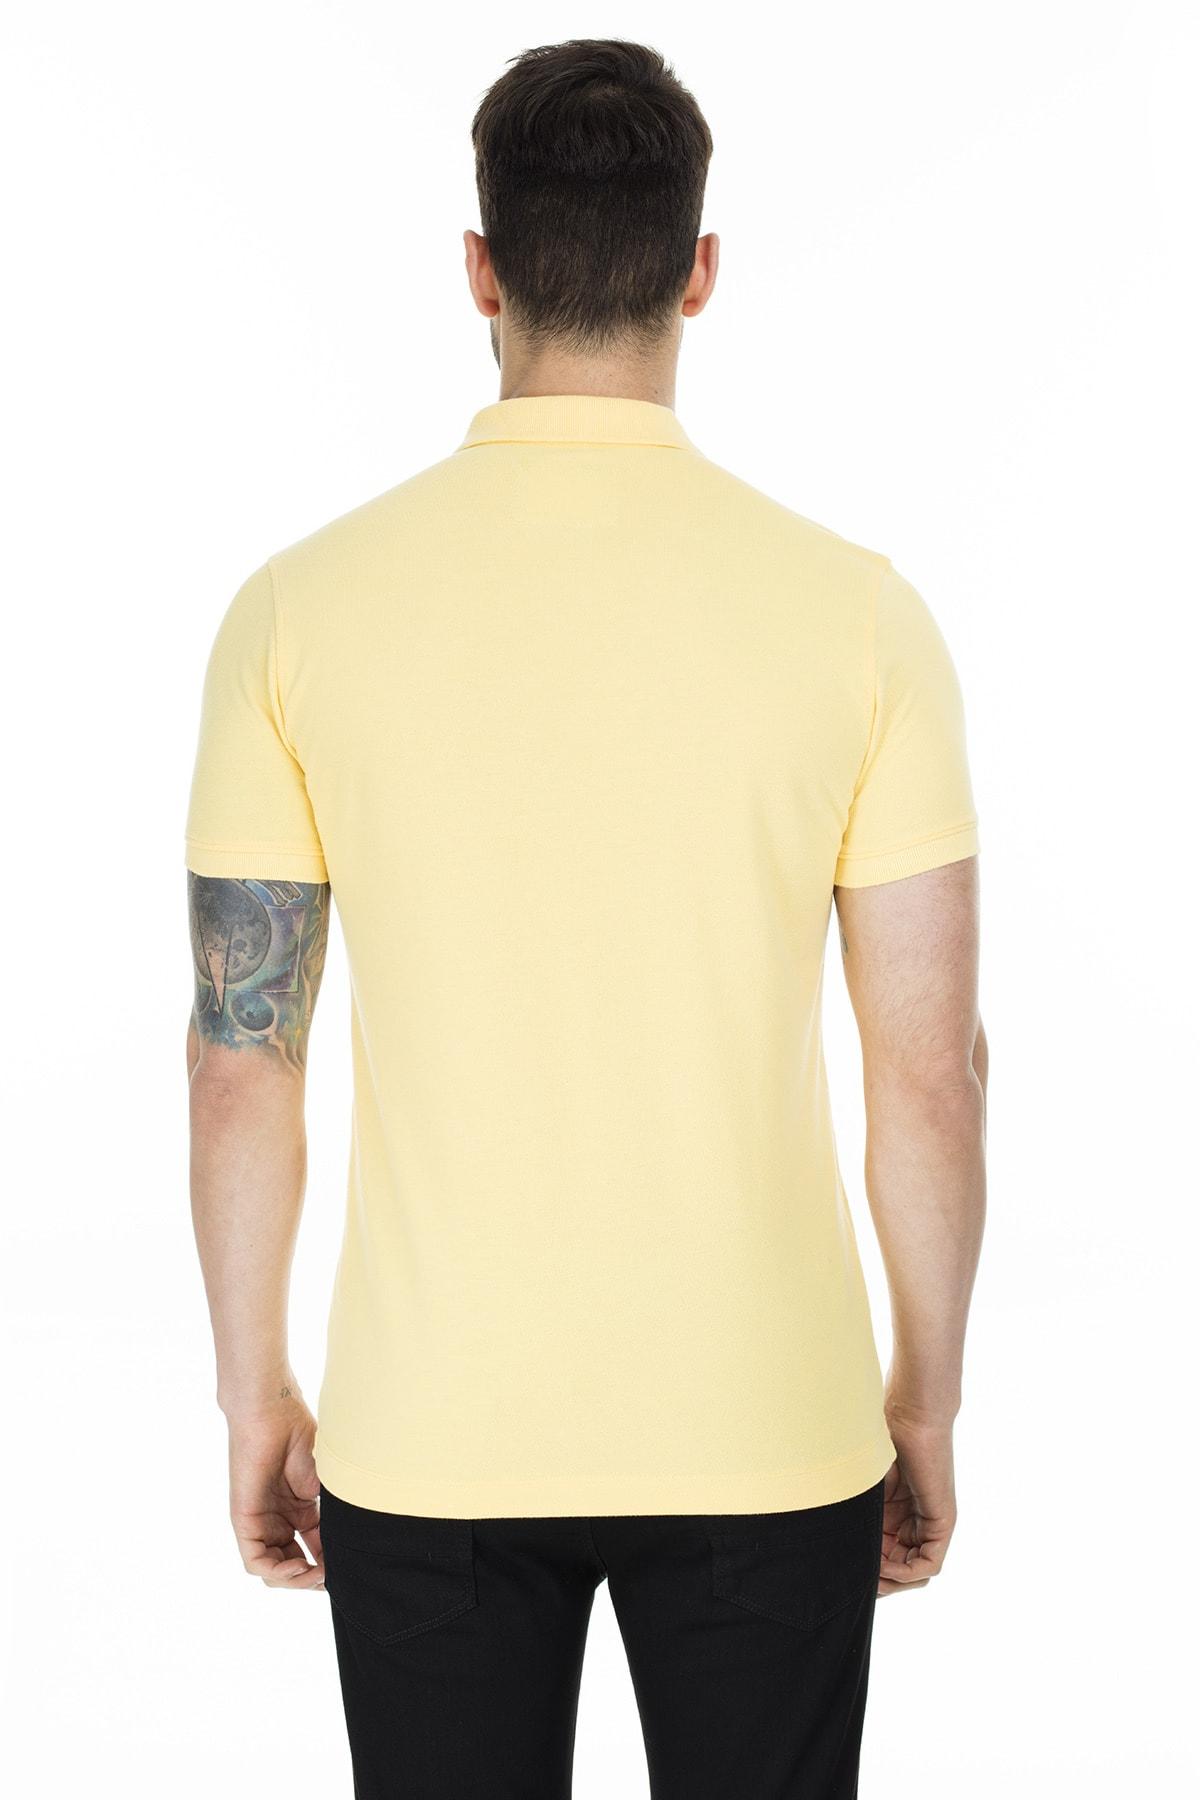 Lufian Laon Spor Polo T- Shirt Sarı 1